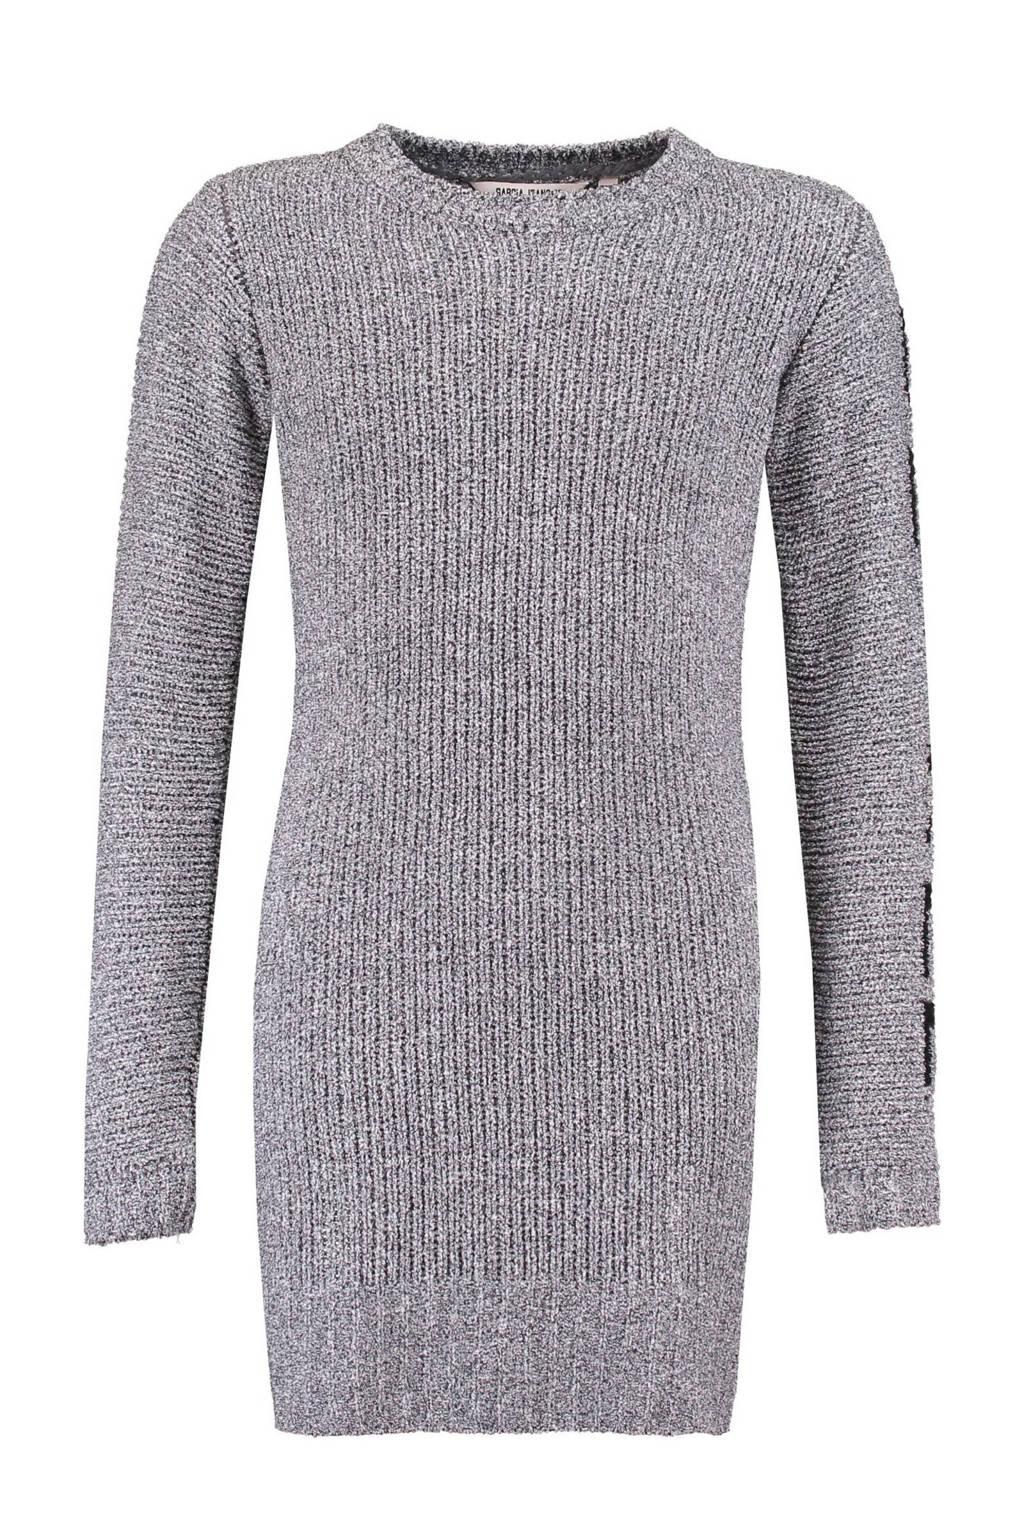 Garcia jurk grijs mêlee, grijs melange/ zwart